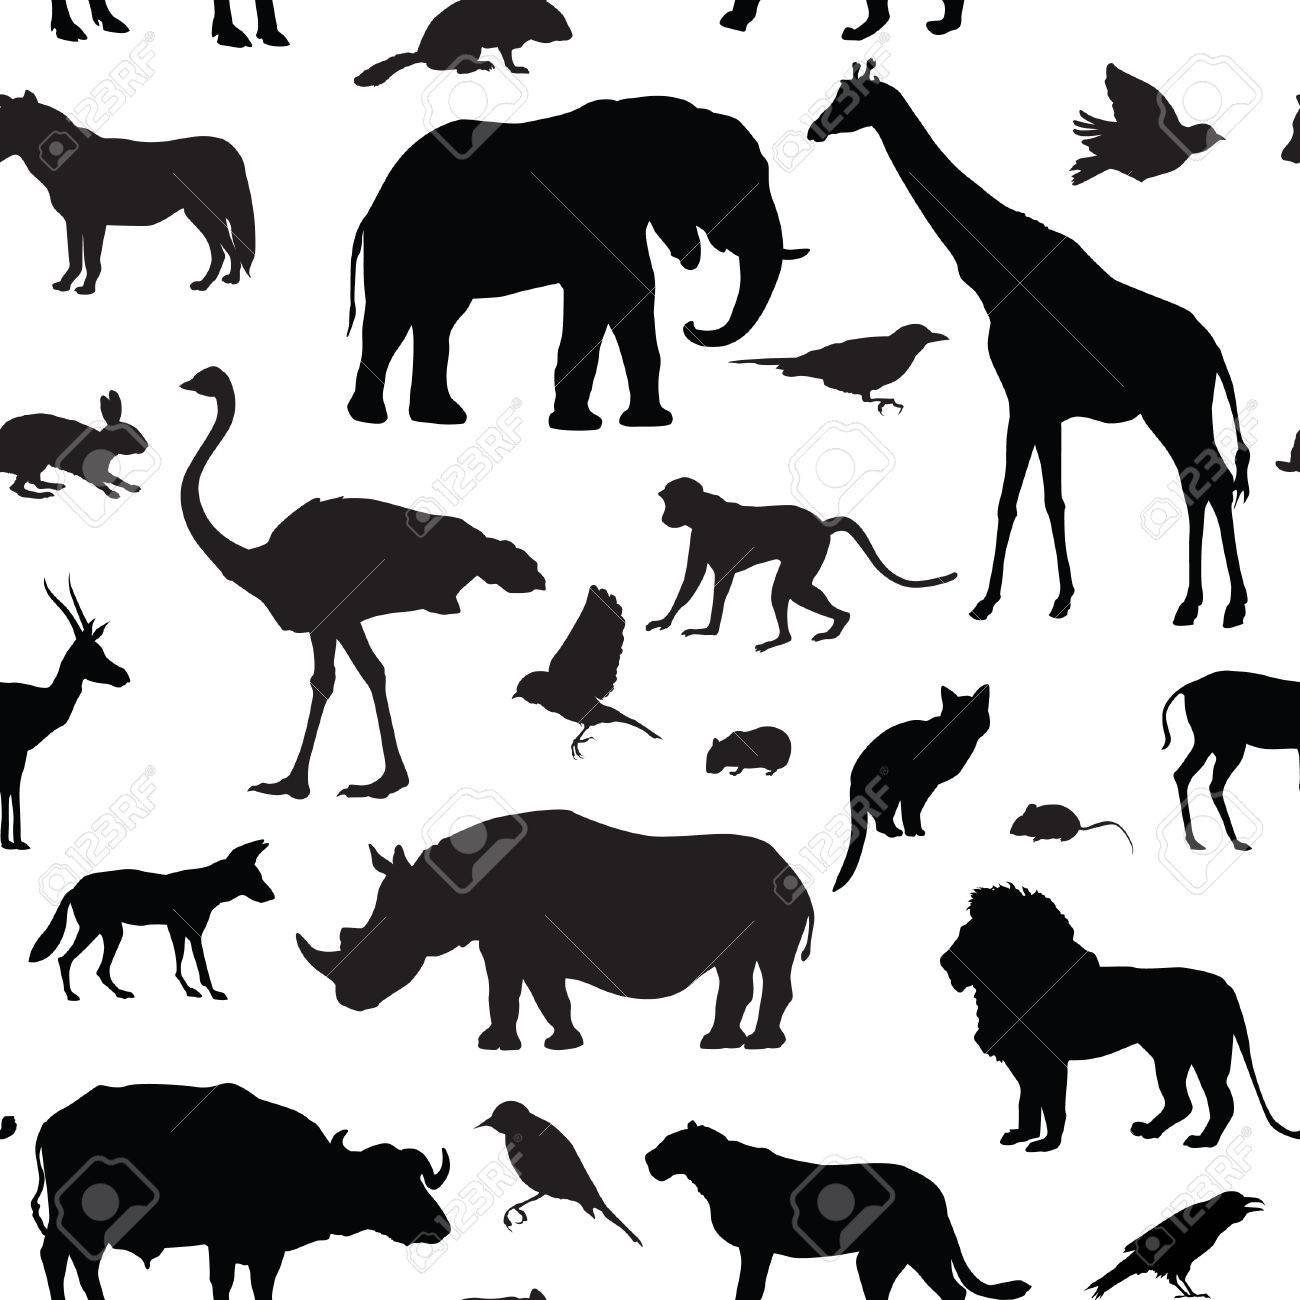 Animals silhouette seamless pattern. Wildlife tiled textured backgroun. African animals seamless pattern Stock Vector - 46073418